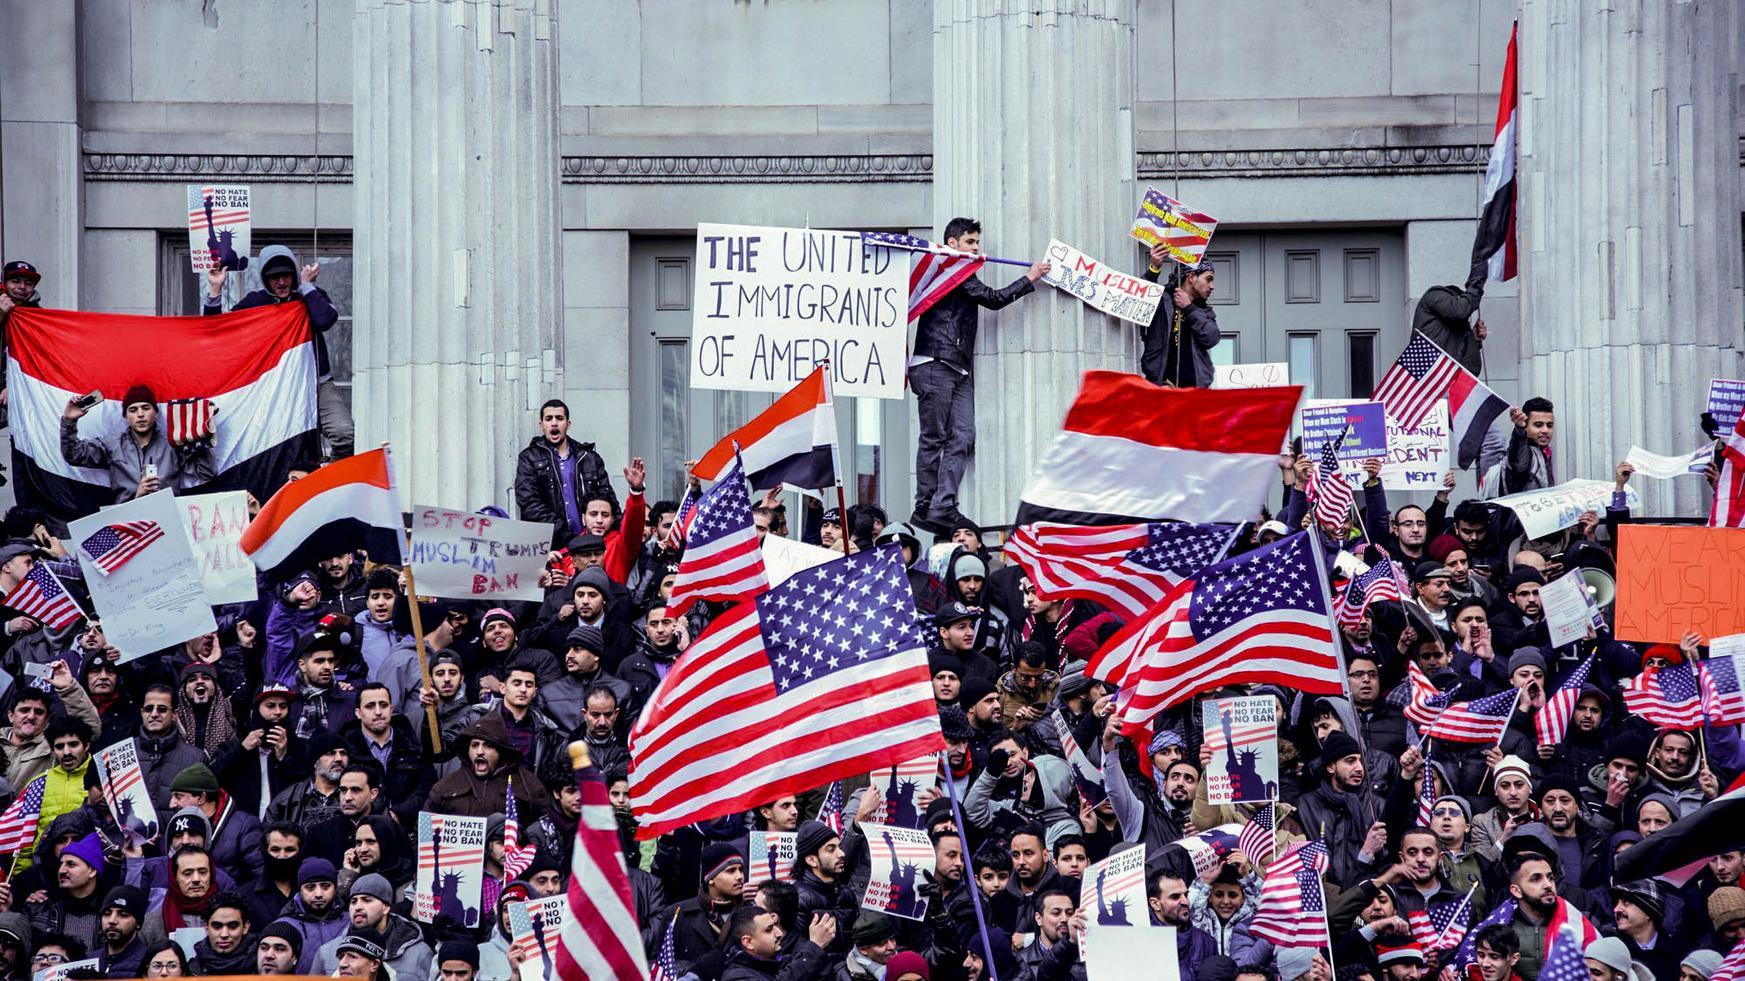 We Spoke to the Yemeni-Americans Who Took Part in NYC's Massive Bodega Strike  (MUNCHIES, FEB 3 2017)